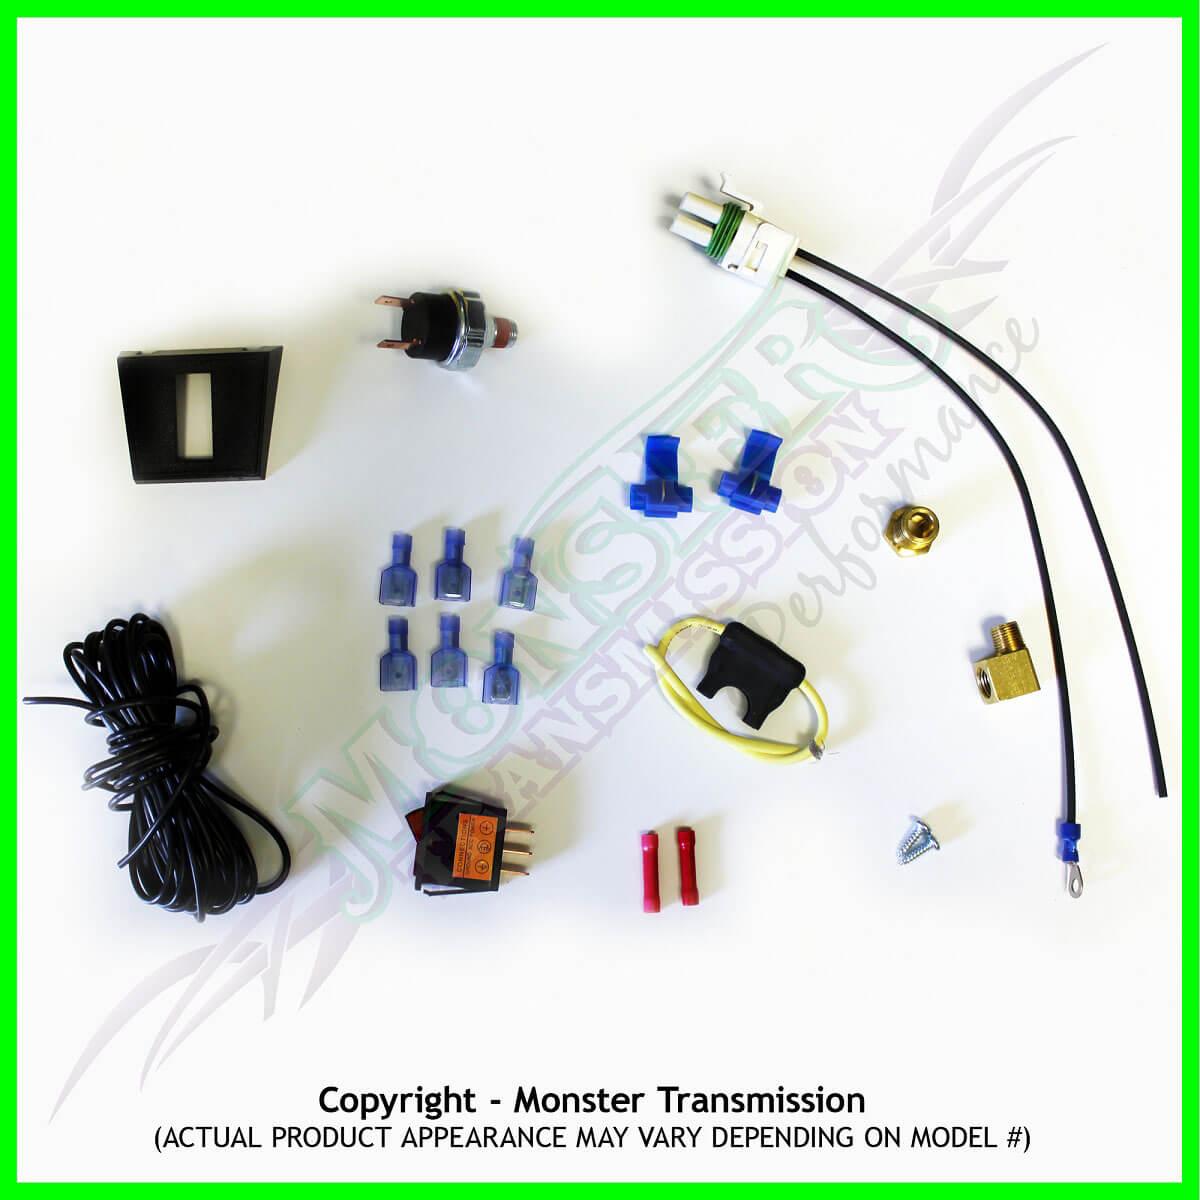 700r4 lockup wiring harness wiring diagram rh vw26 vom winnenthal de 700r4 lockup wiring kit